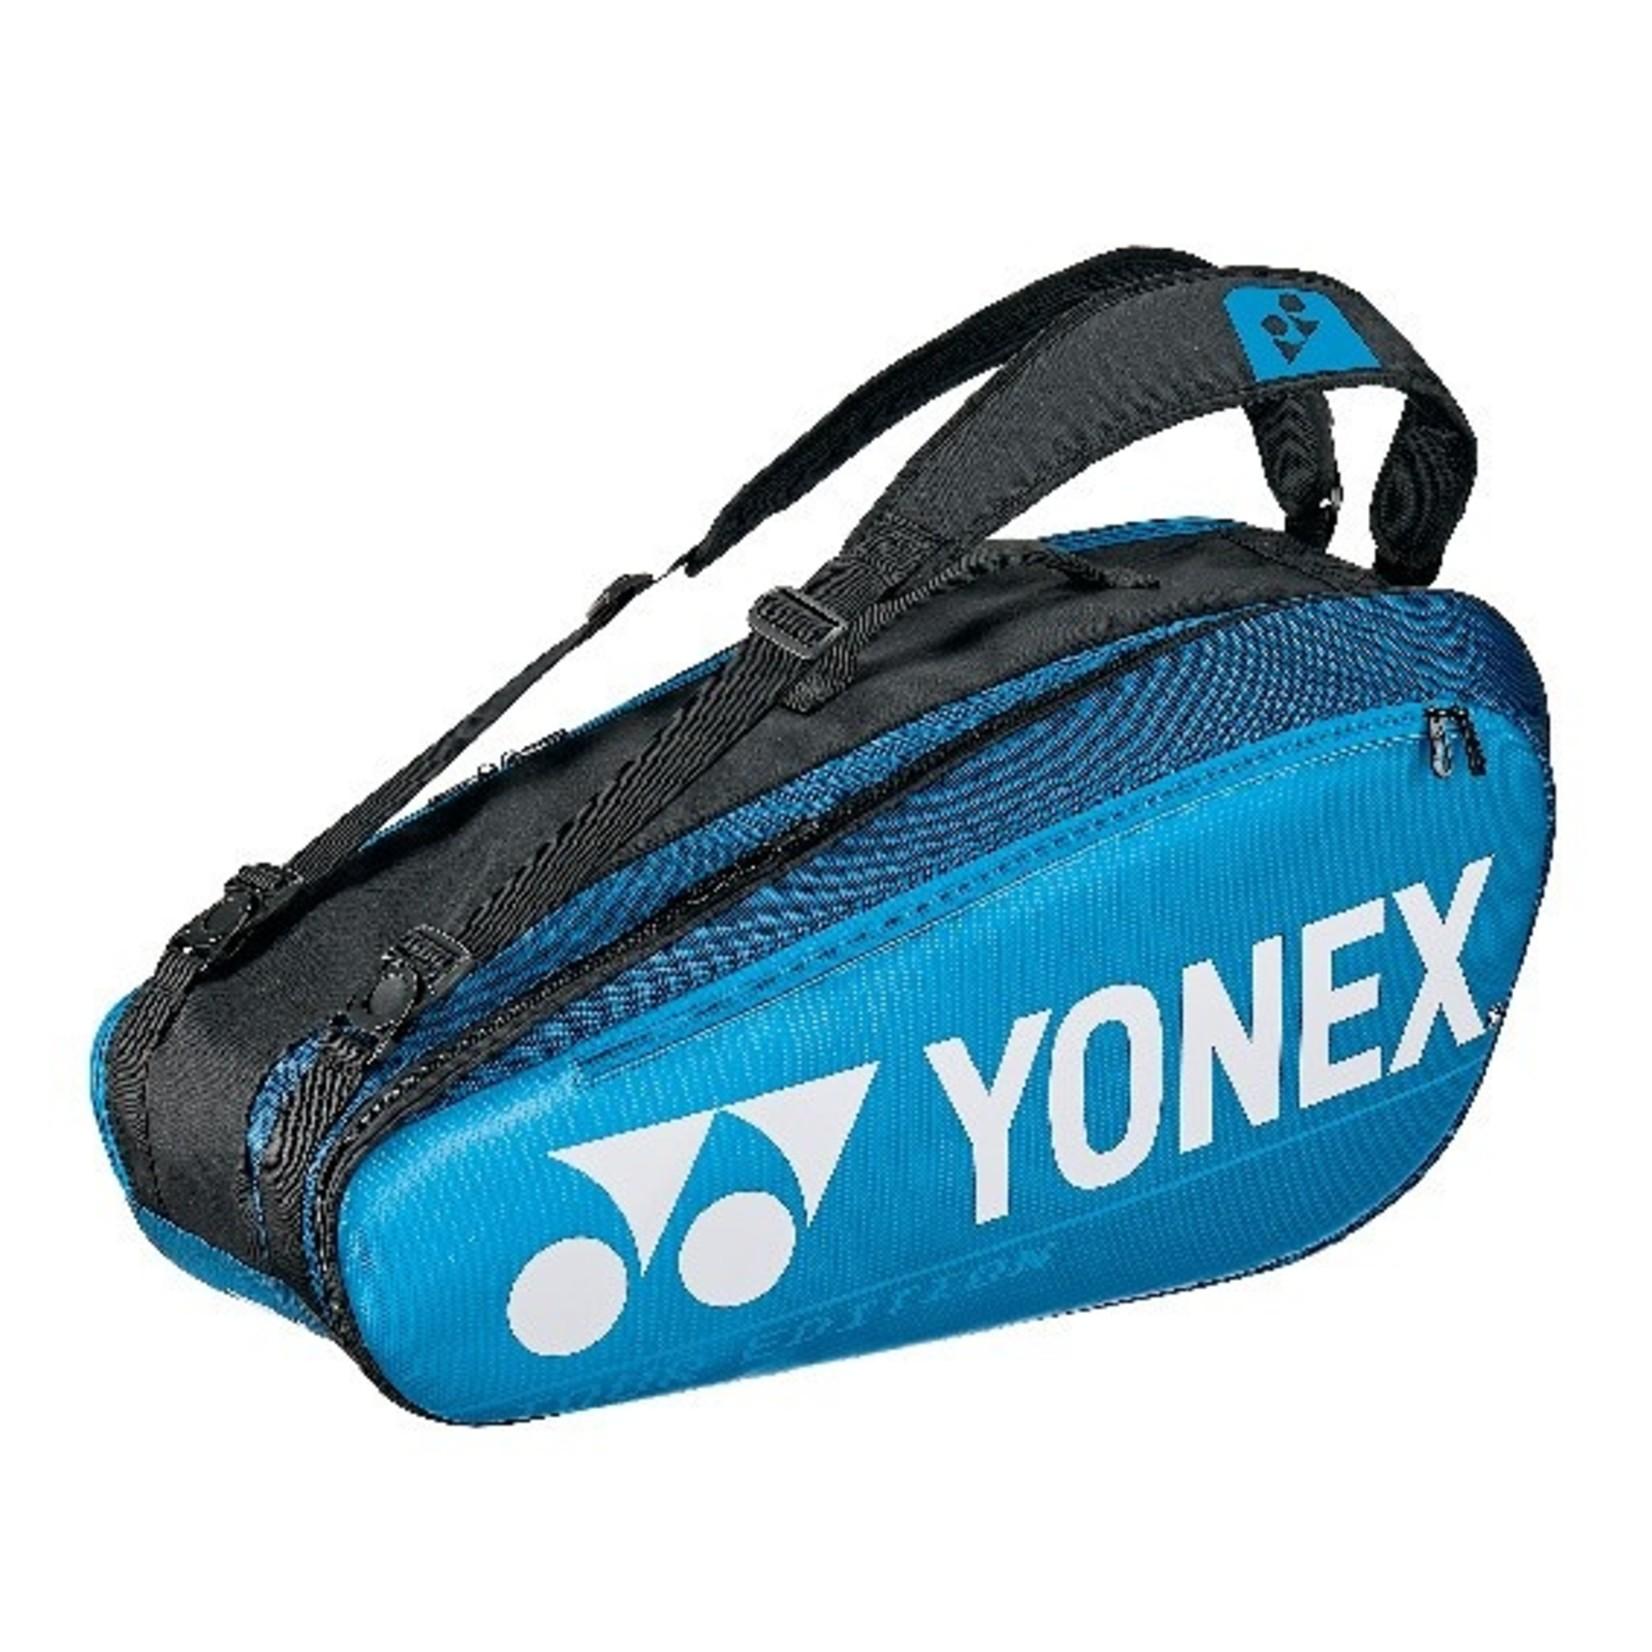 Yonex Pro Racket Bag x6